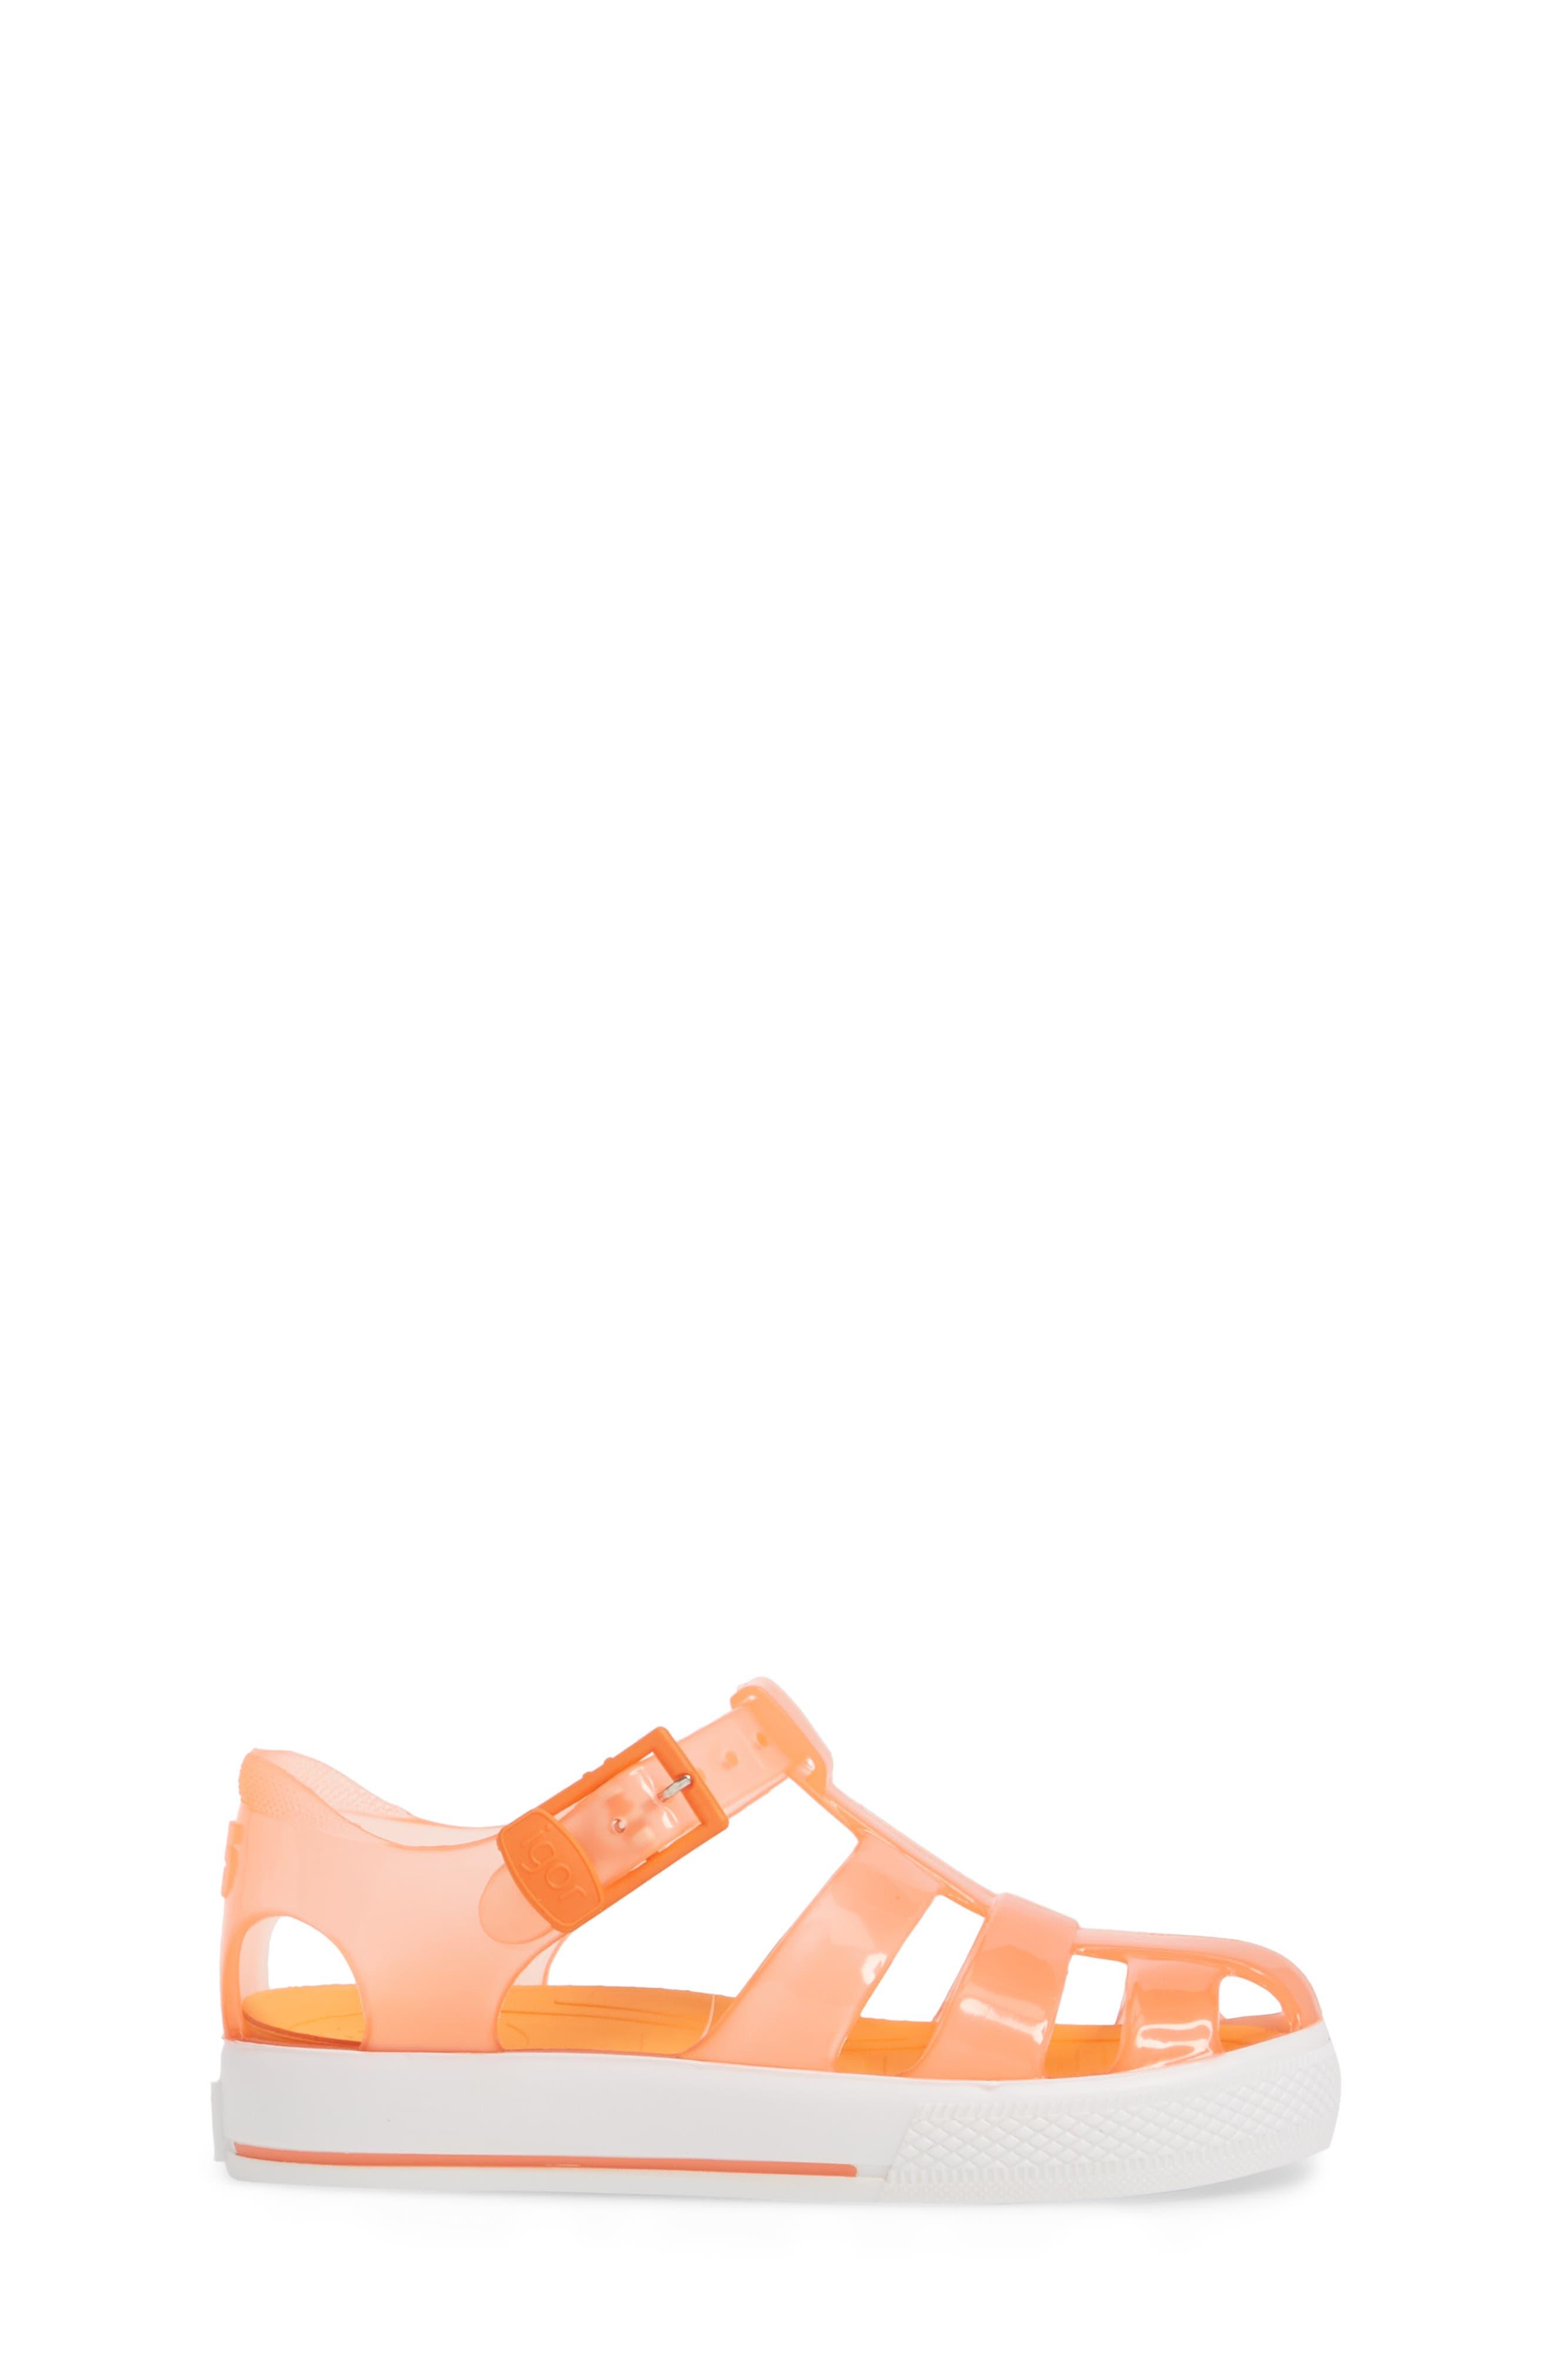 Tenis Fisherman Jelly Sandal,                             Alternate thumbnail 3, color,                             Crystal Neon Orange